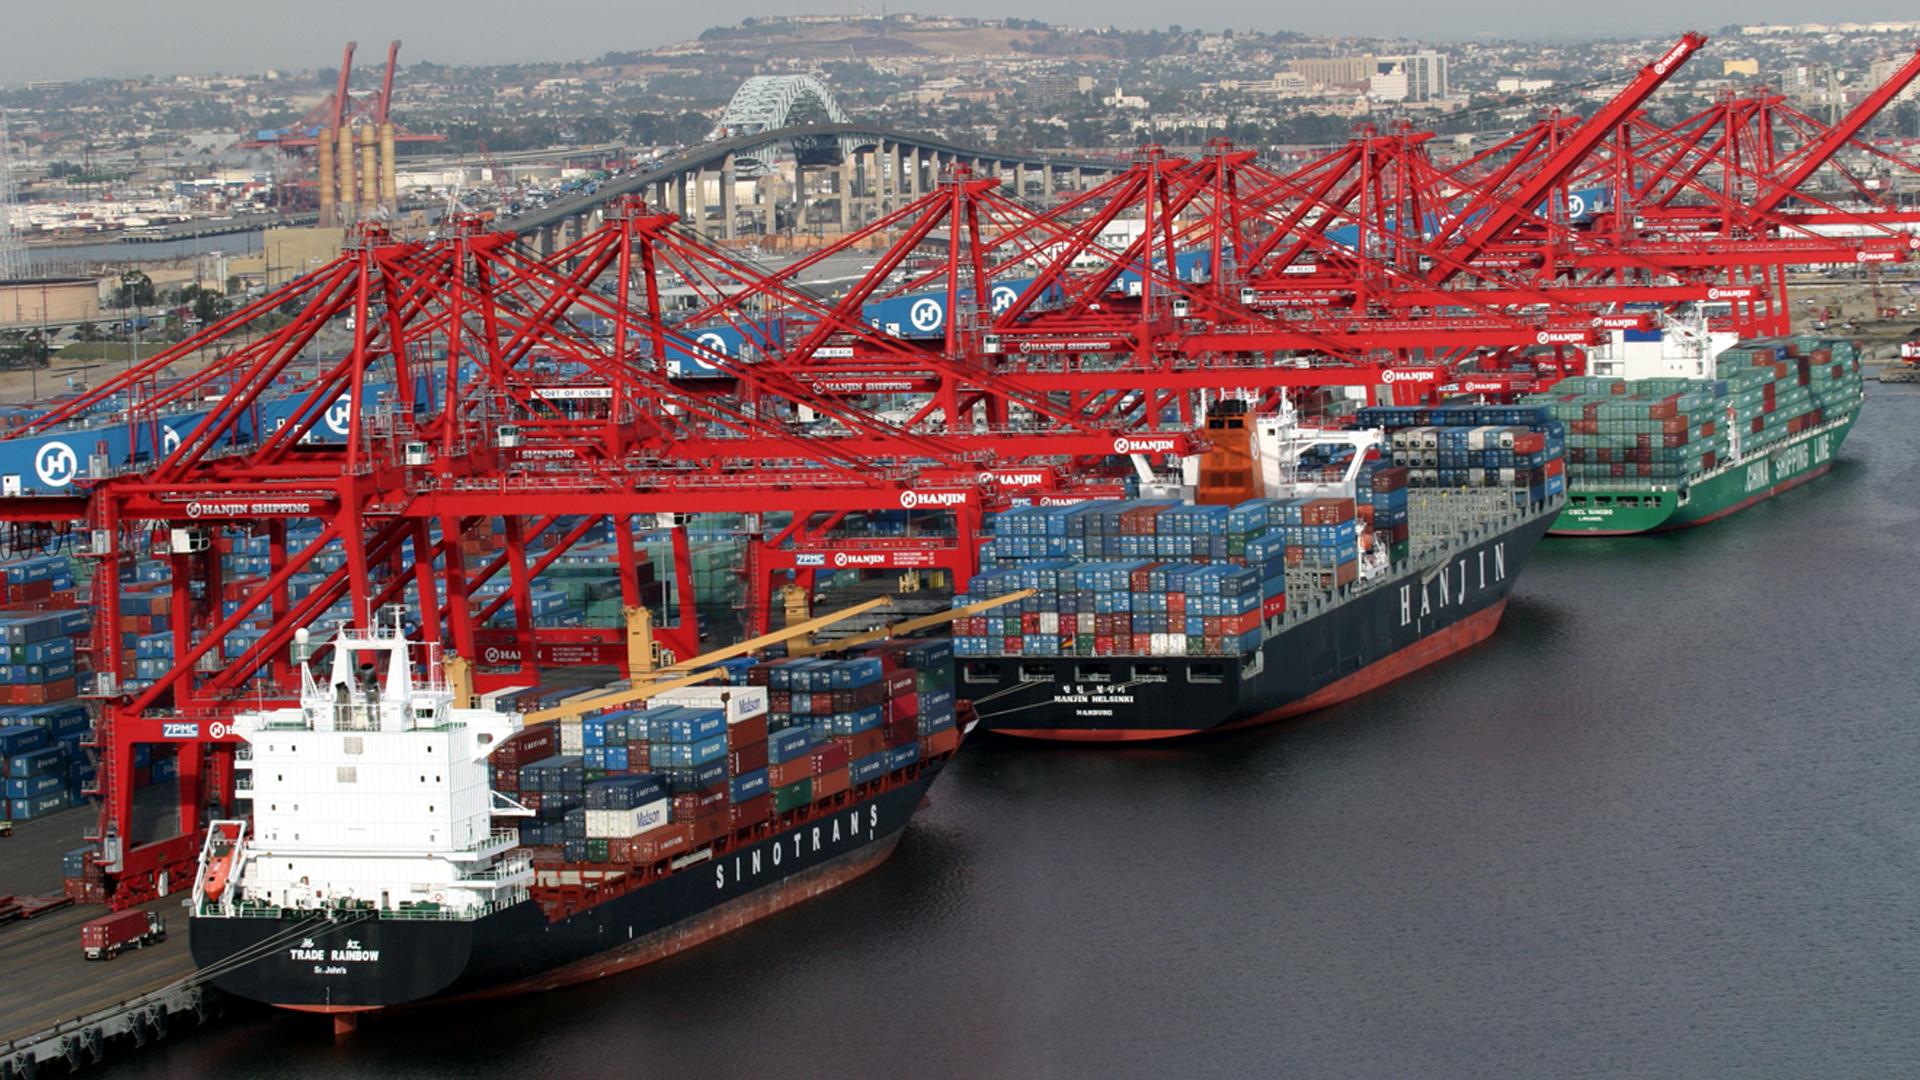 UWL - The Asset-Based Freight Forwarder - NVOCC - Port of Long Beach